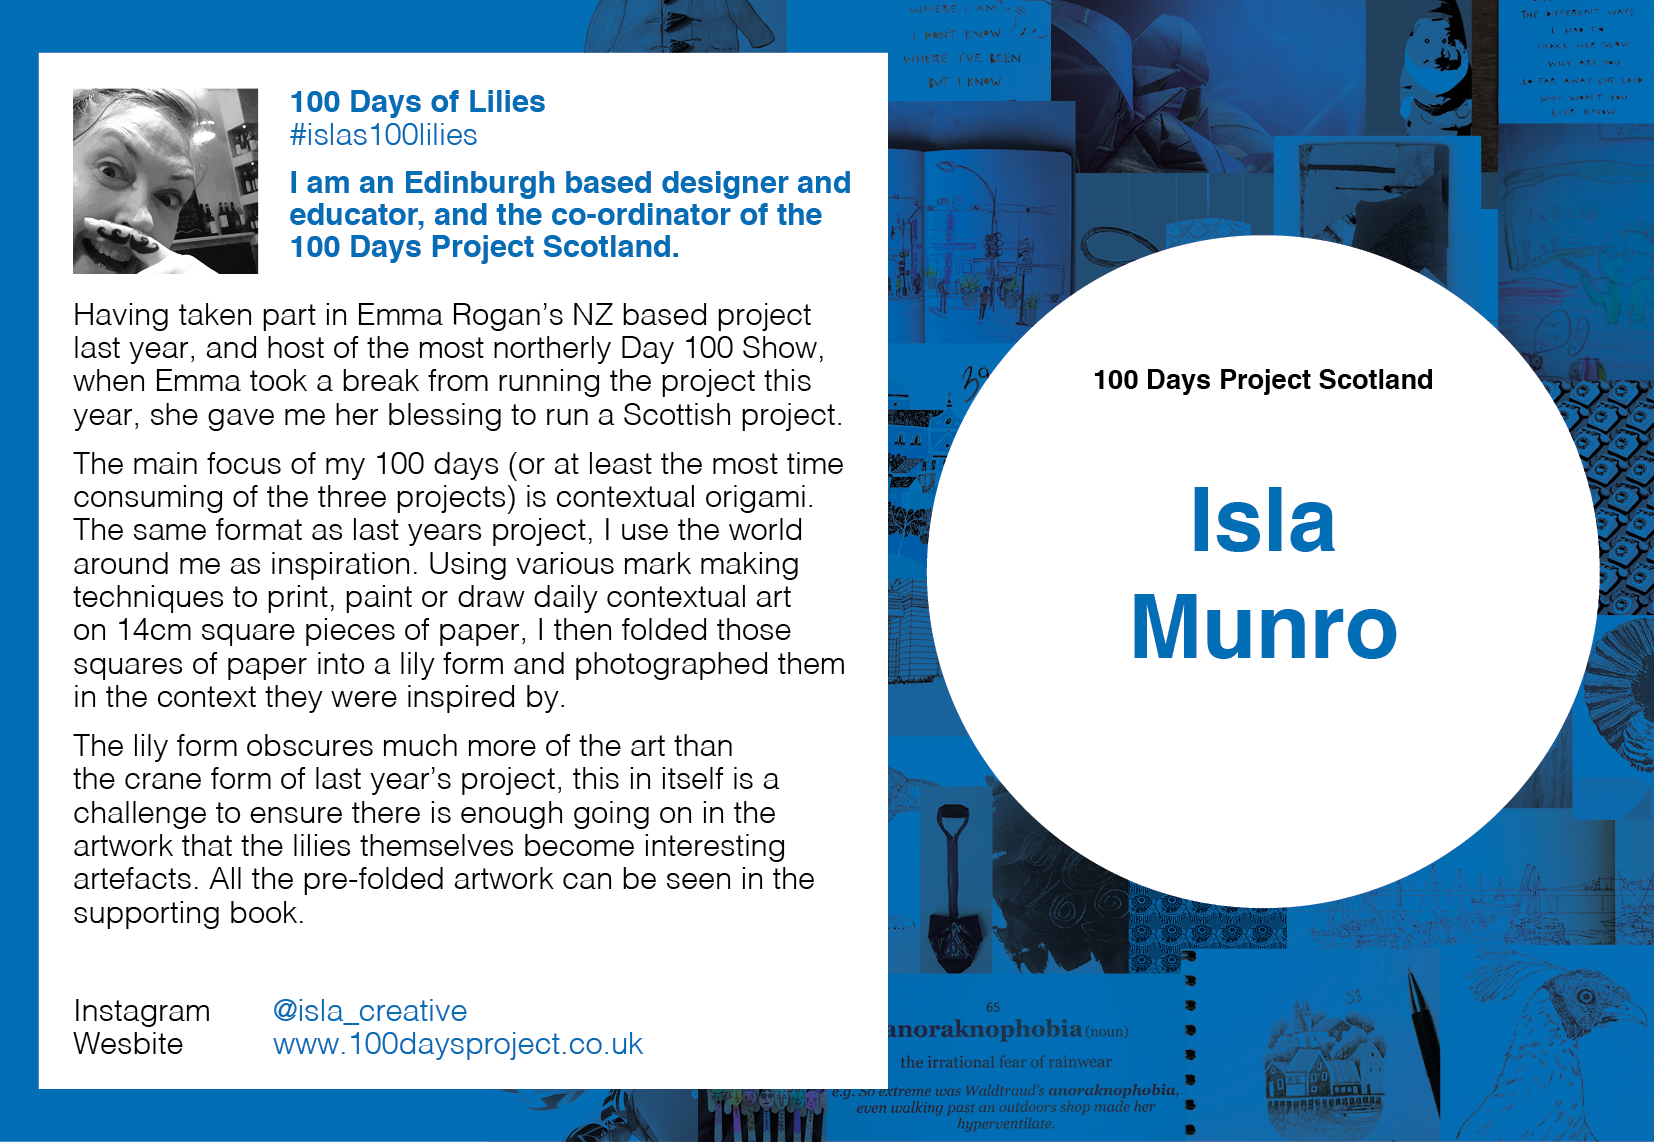 Isla Munro - 100 Days of Lilies